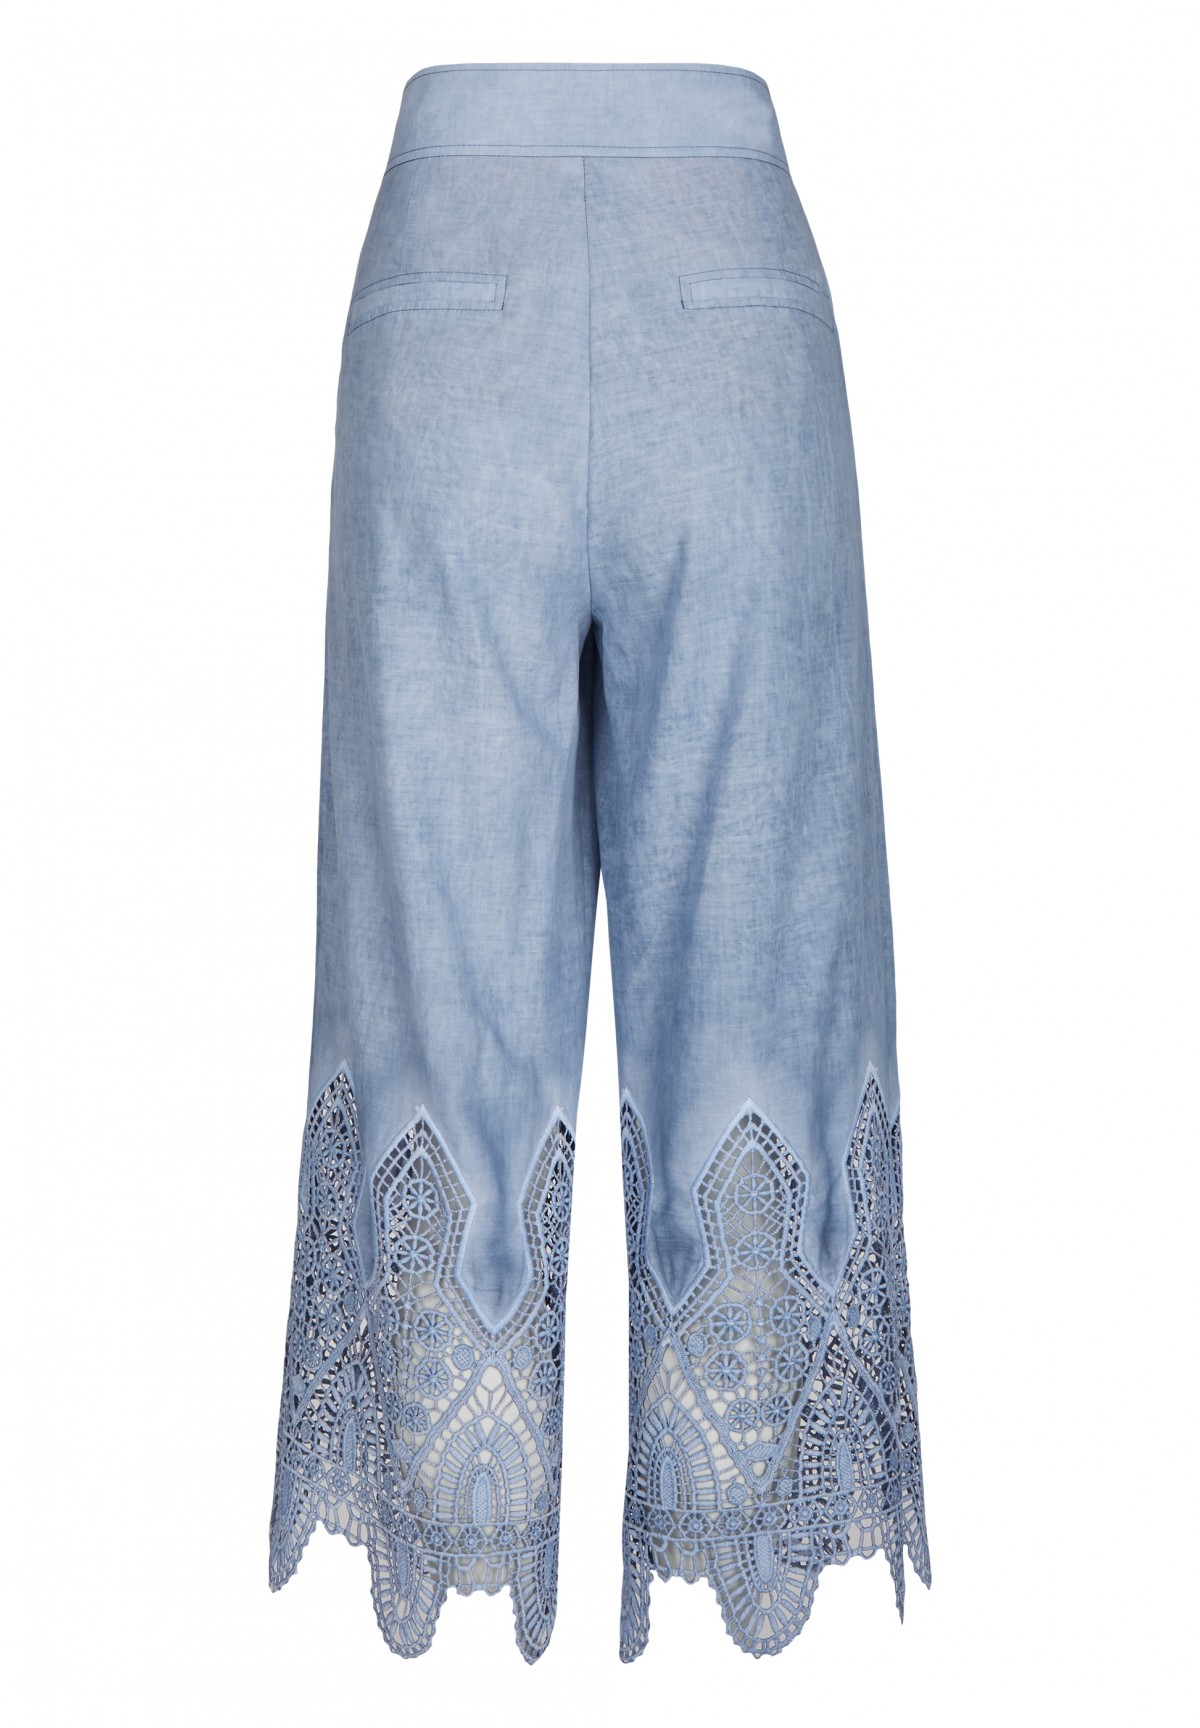 Pantalon large taille haute /